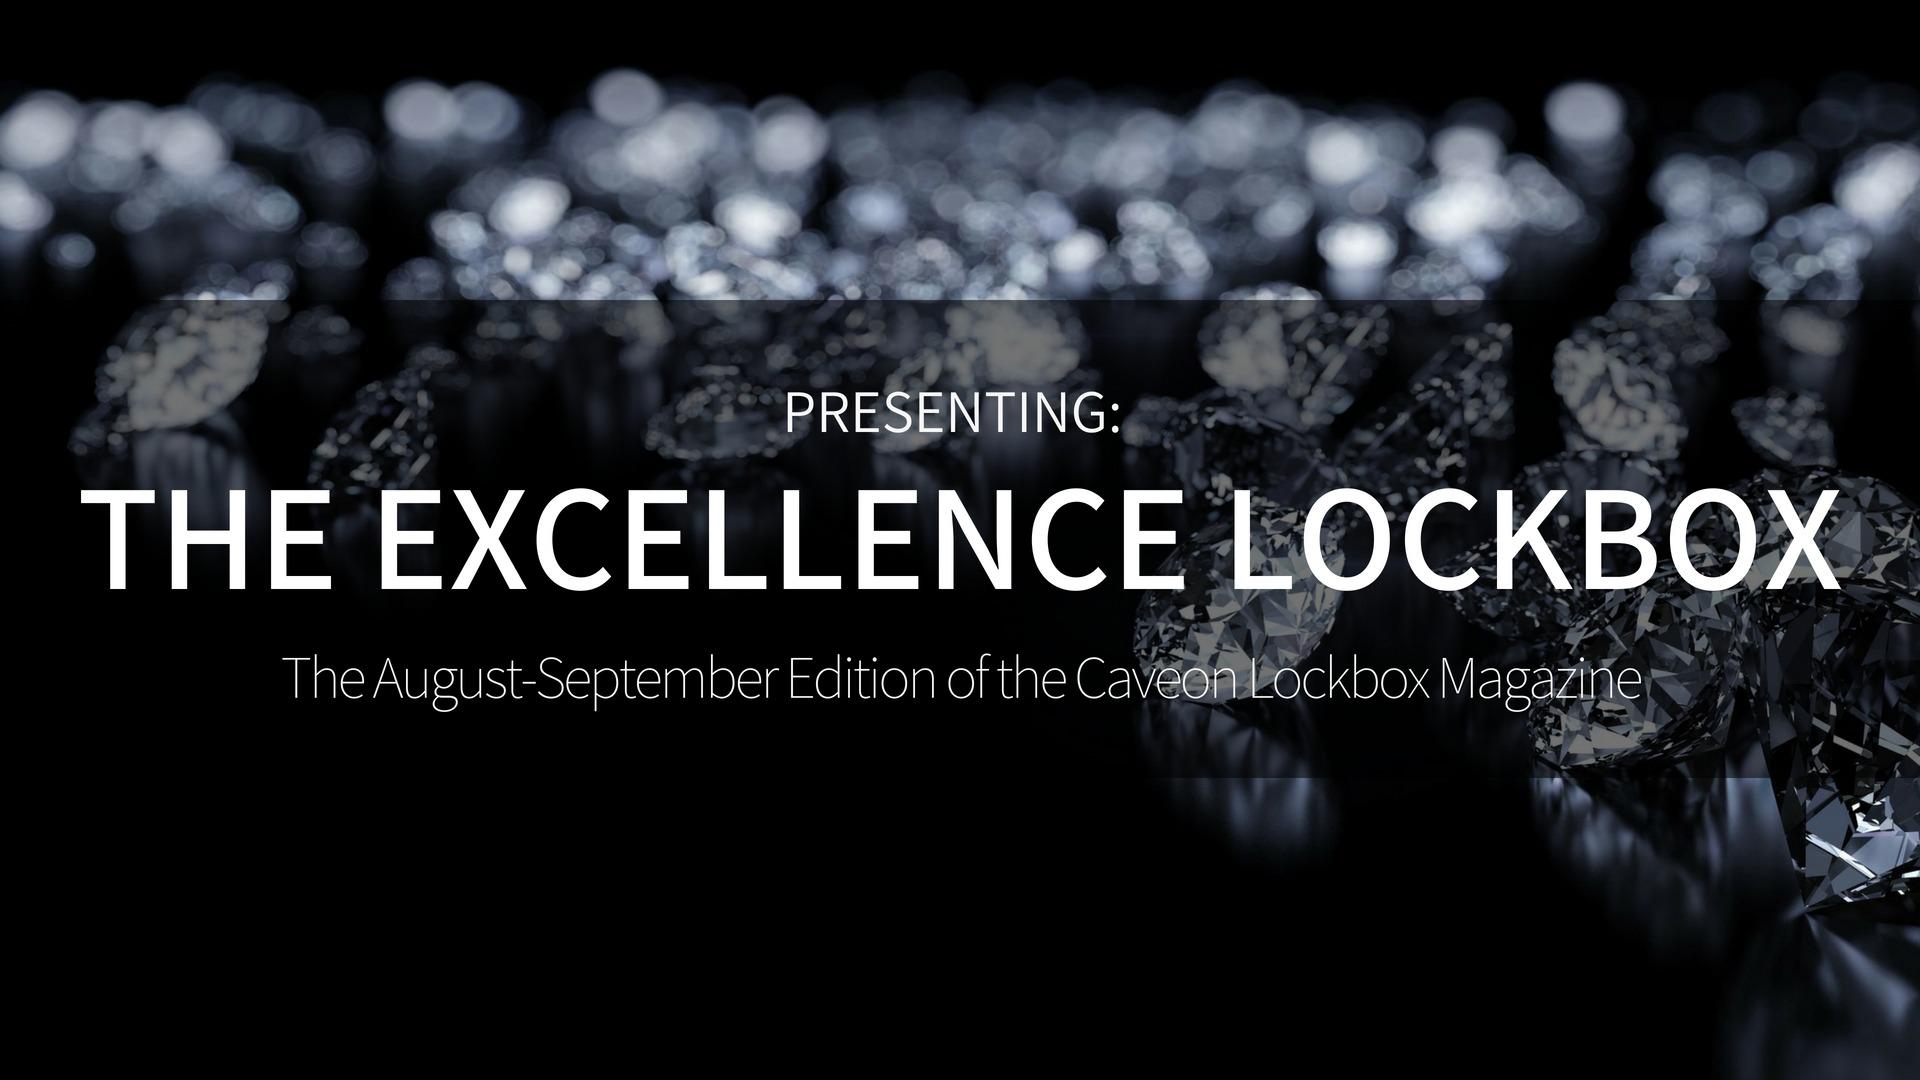 The Caveon Lockbox - Excellence Edition